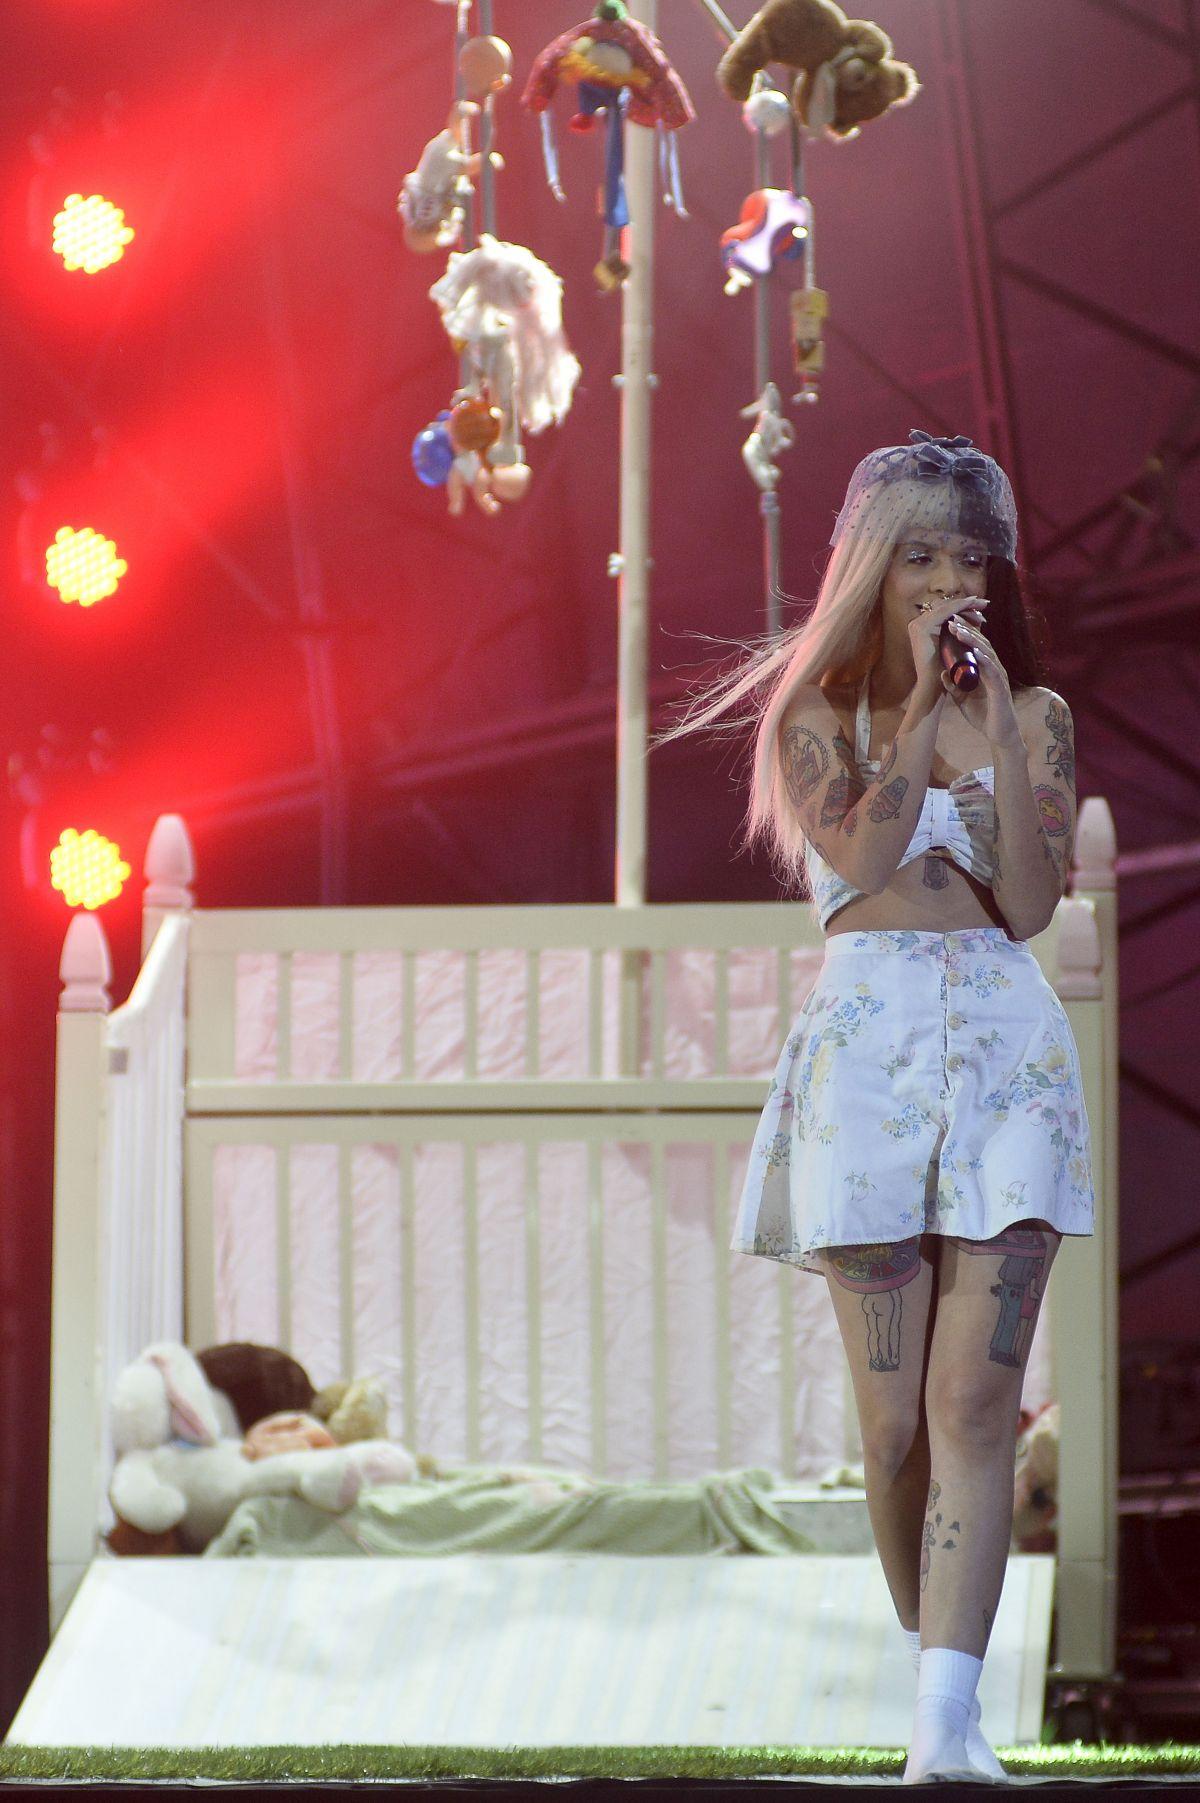 MELANIE MARTINEZ Performs At Lollapalooza Brazil Day 2 In